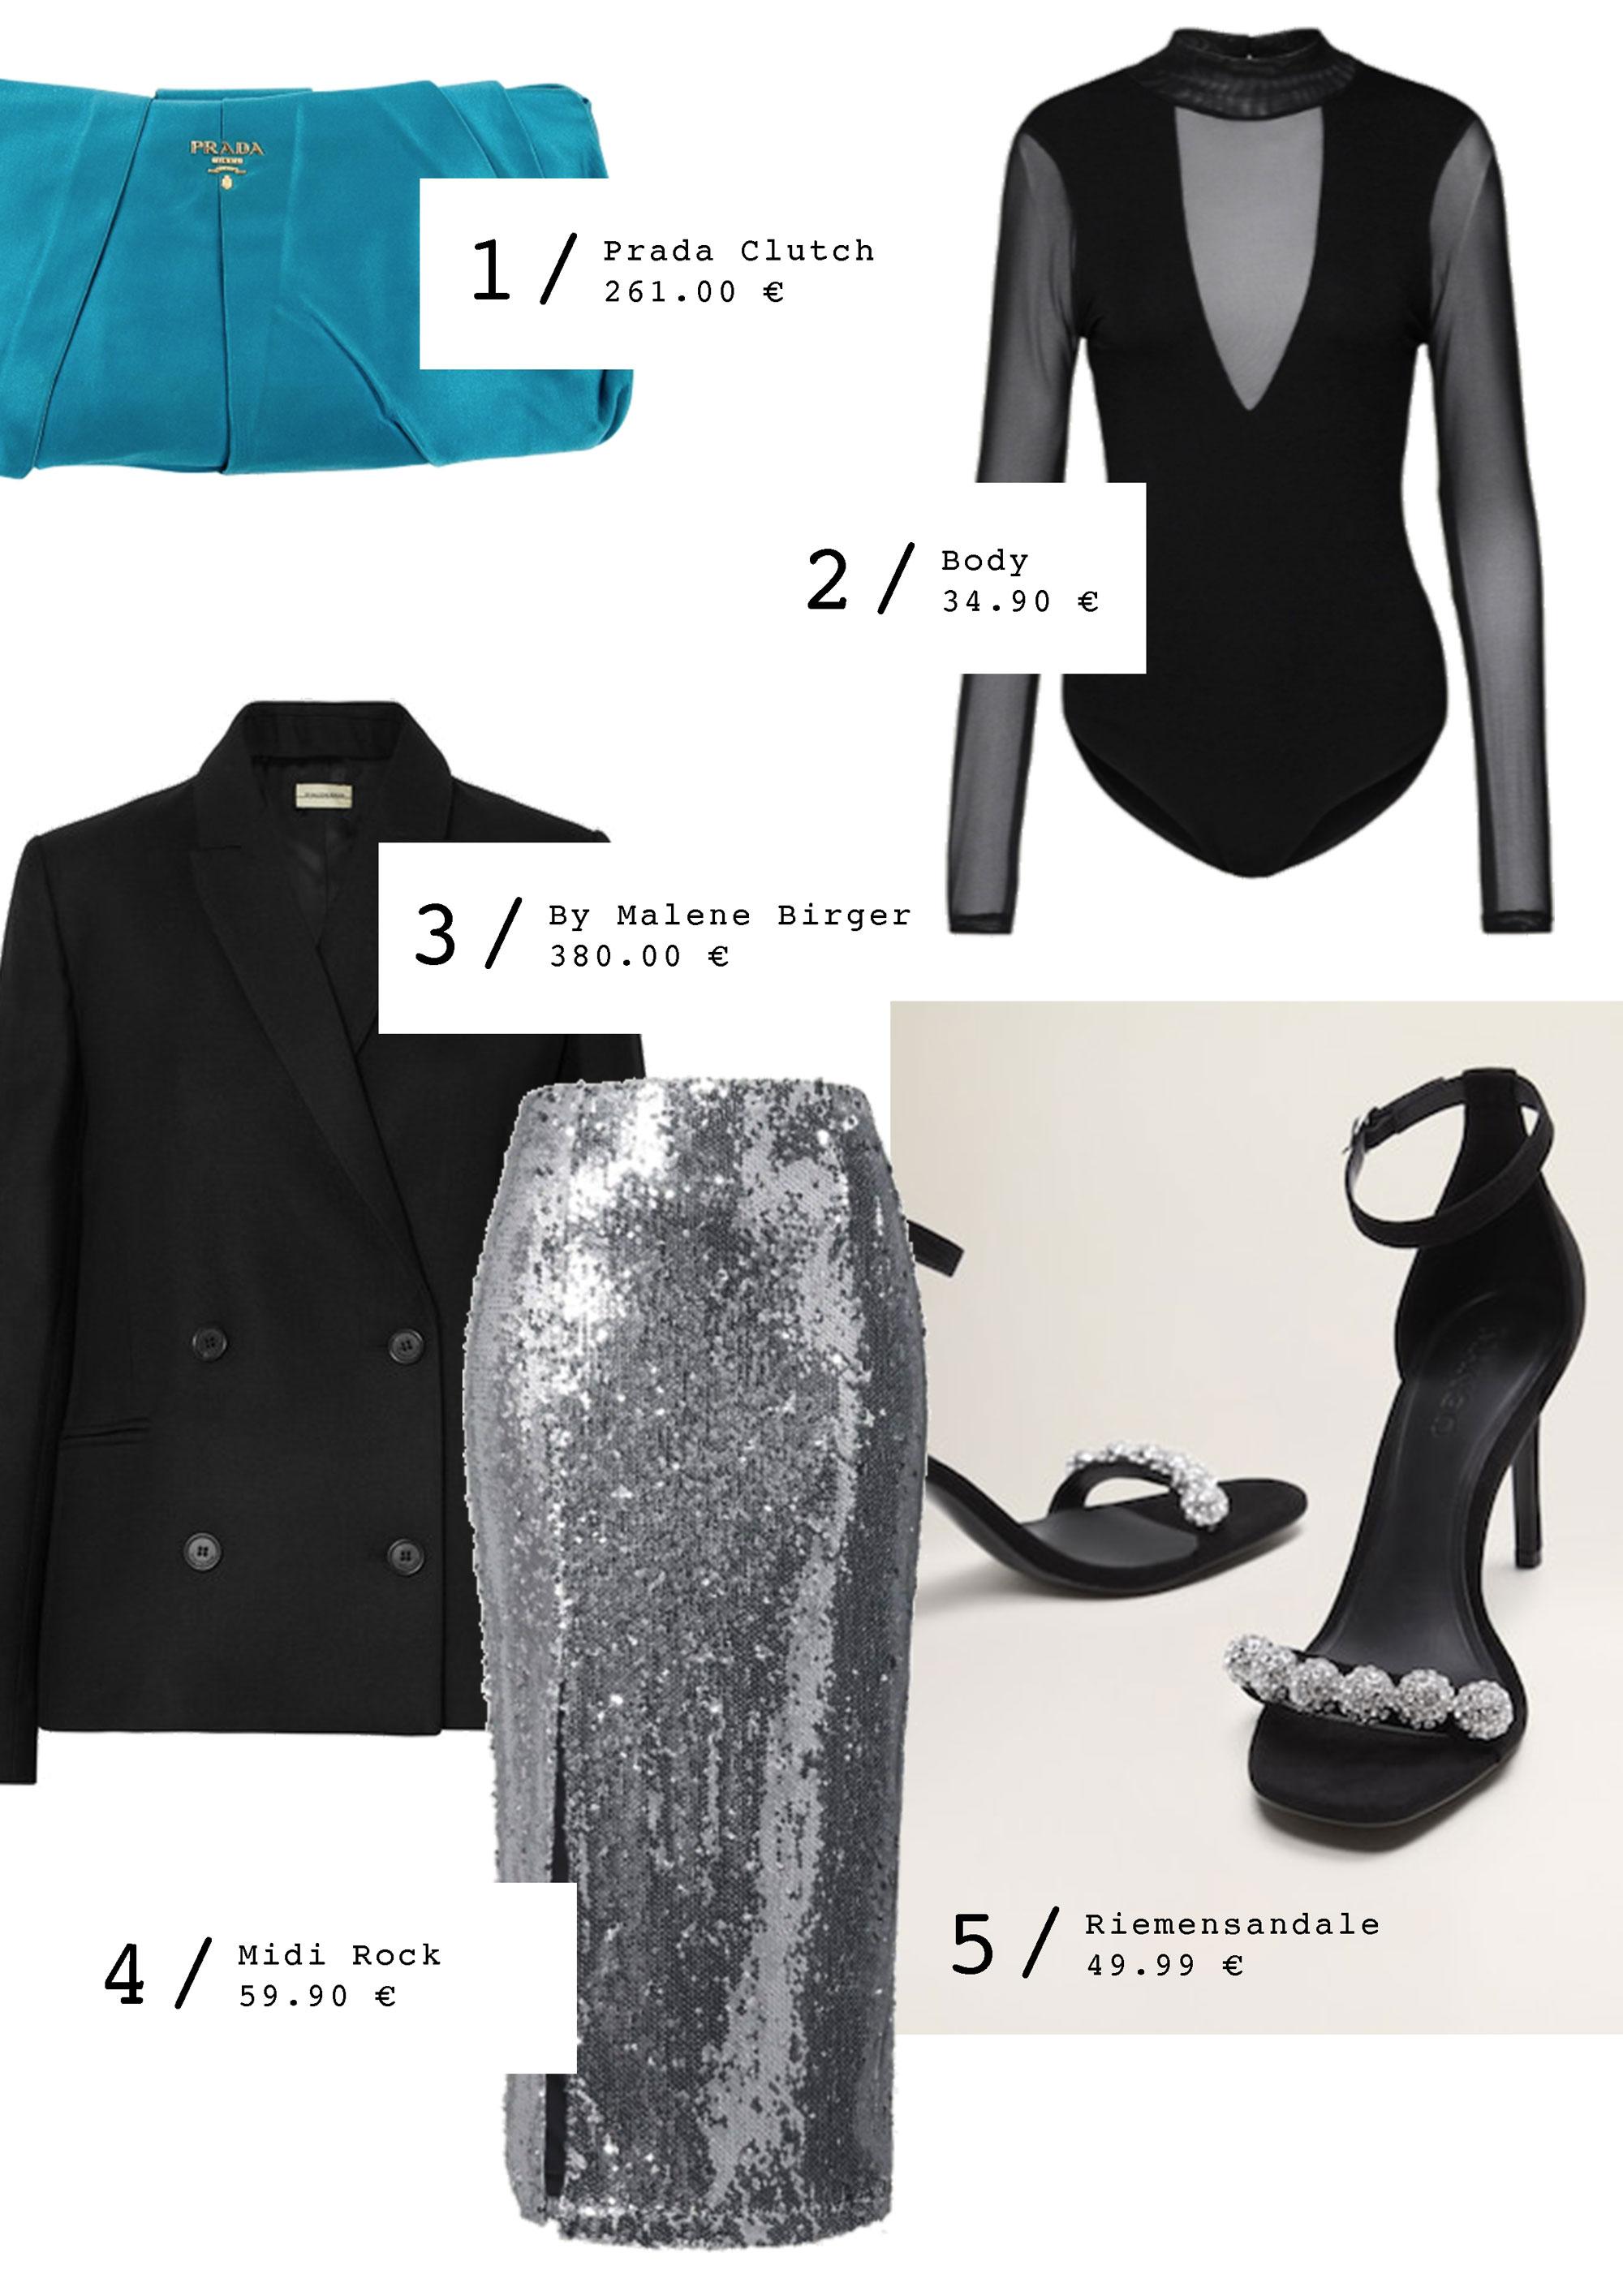 Black Friday Shopping Tipps - www.lesfactoryfemmes.com